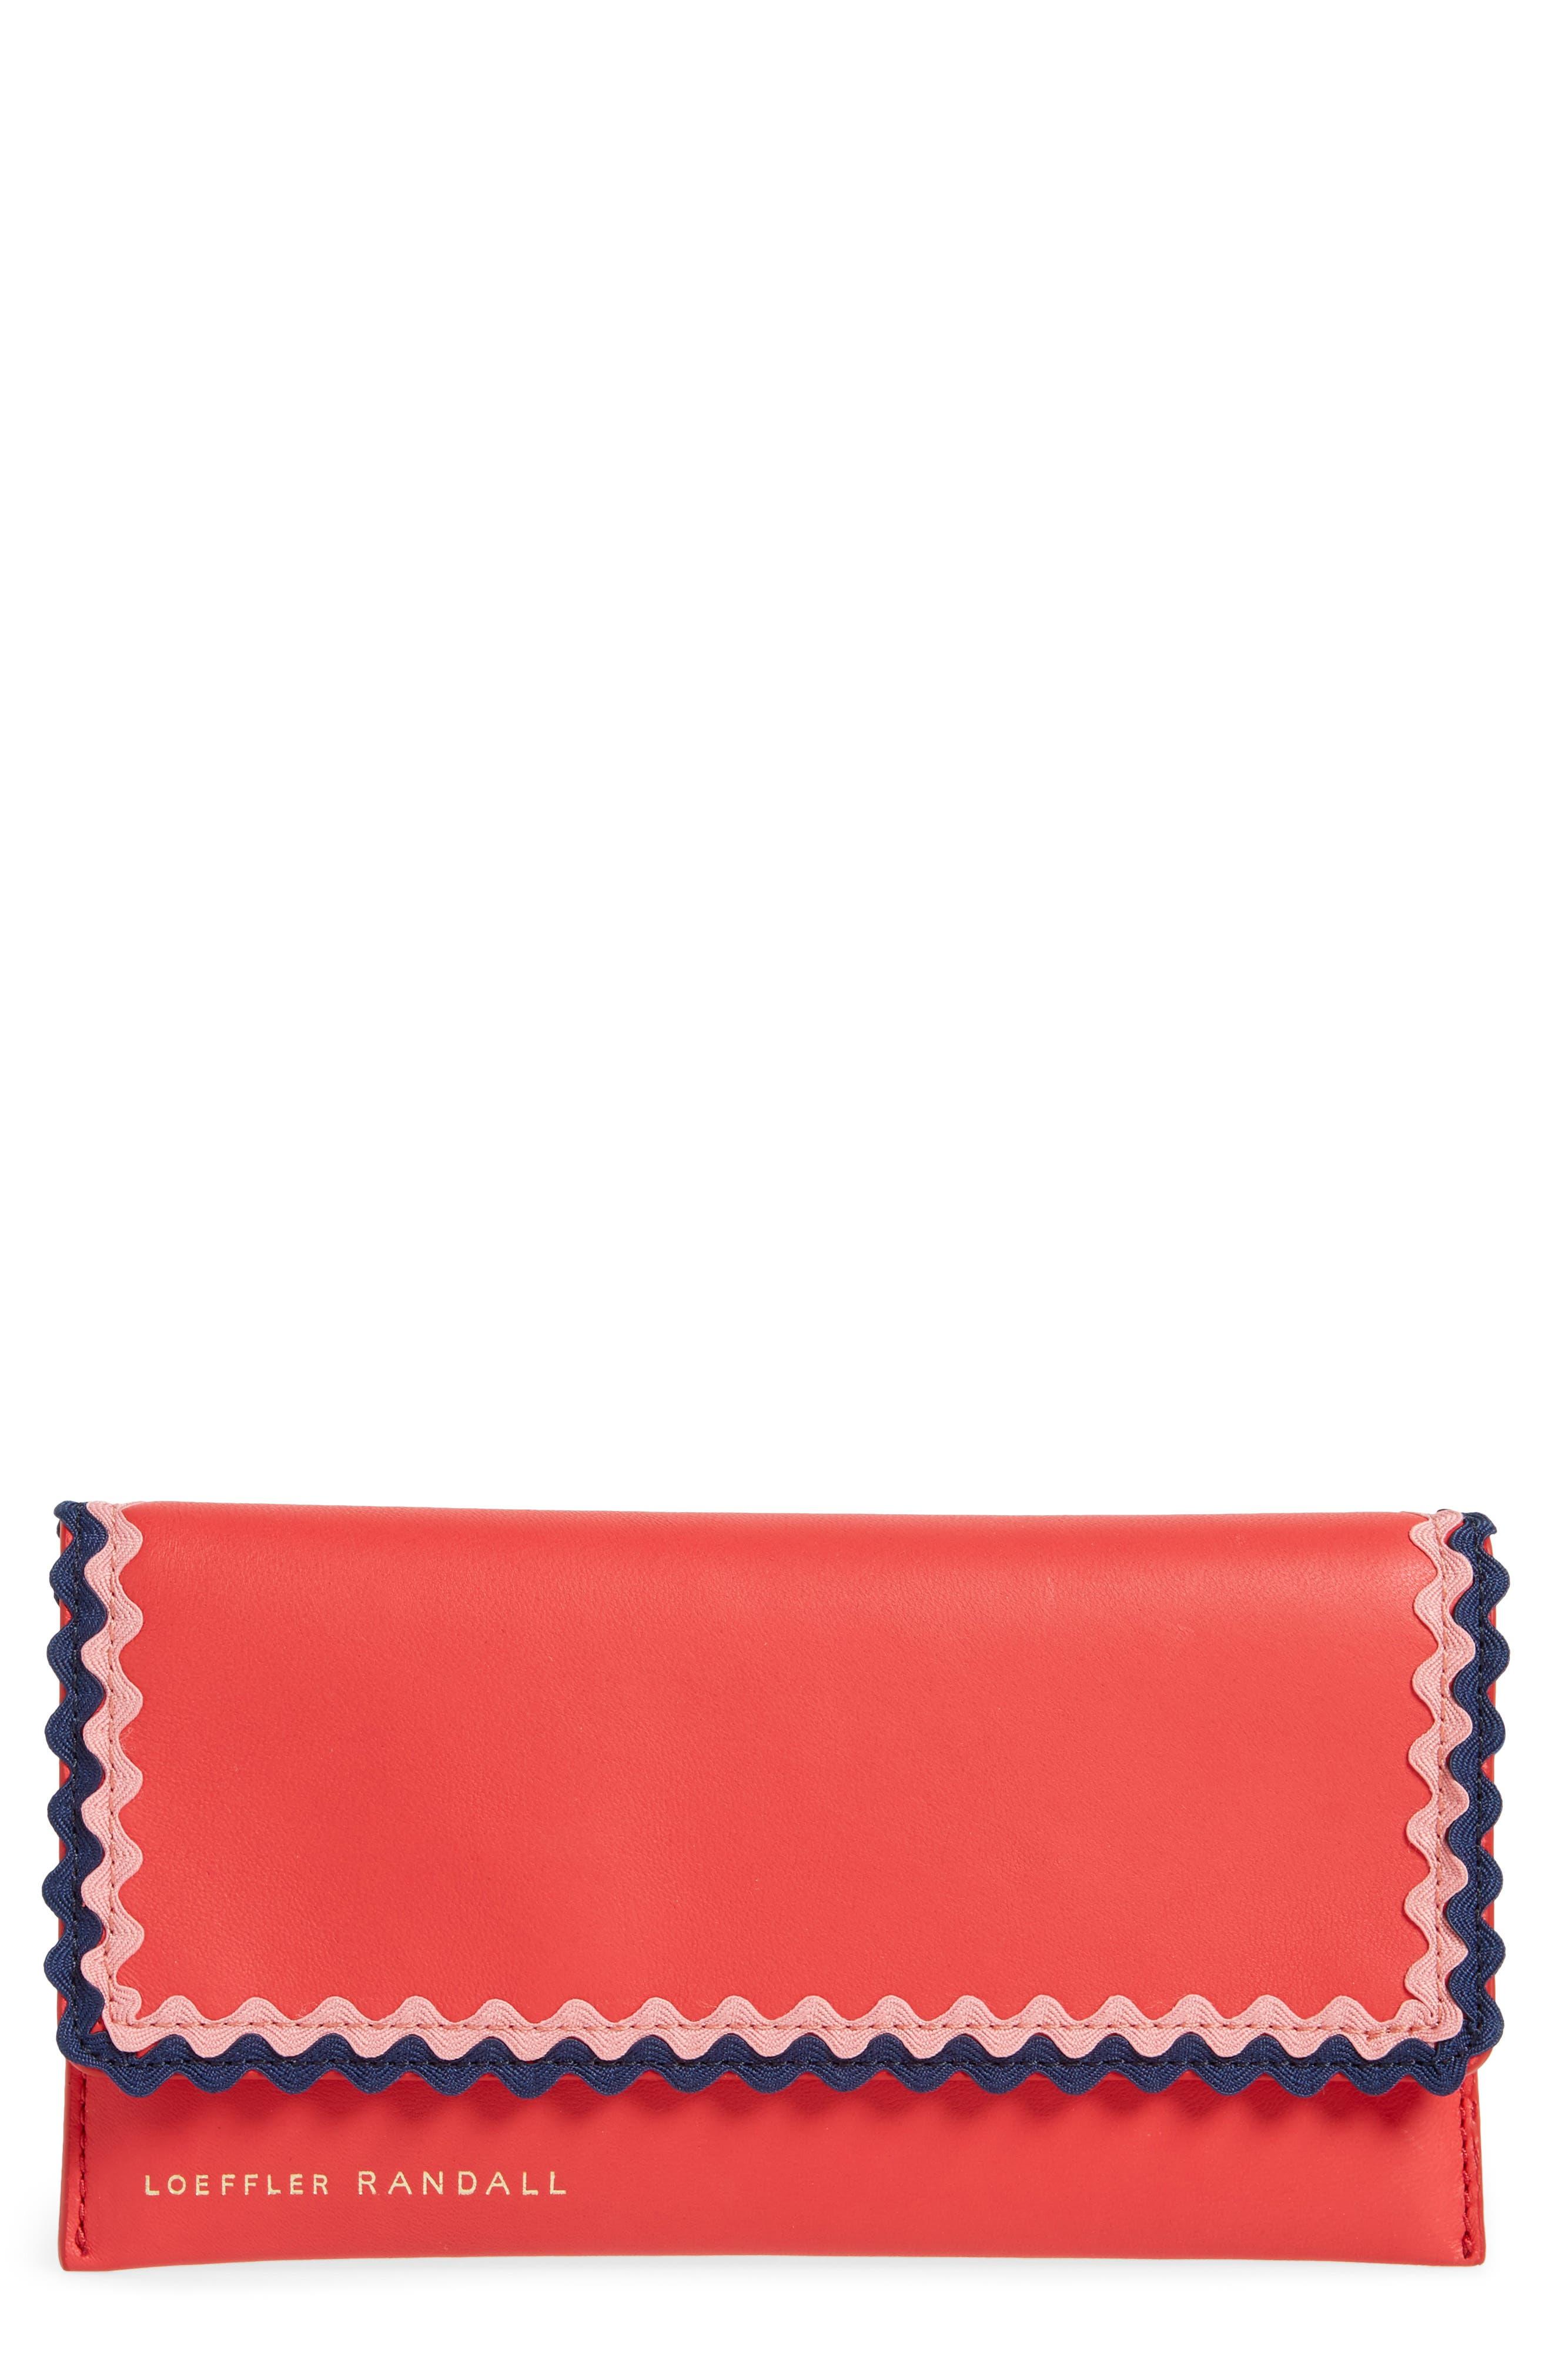 Main Image - Loeffler Randall Everything Embellished Leather Wallet